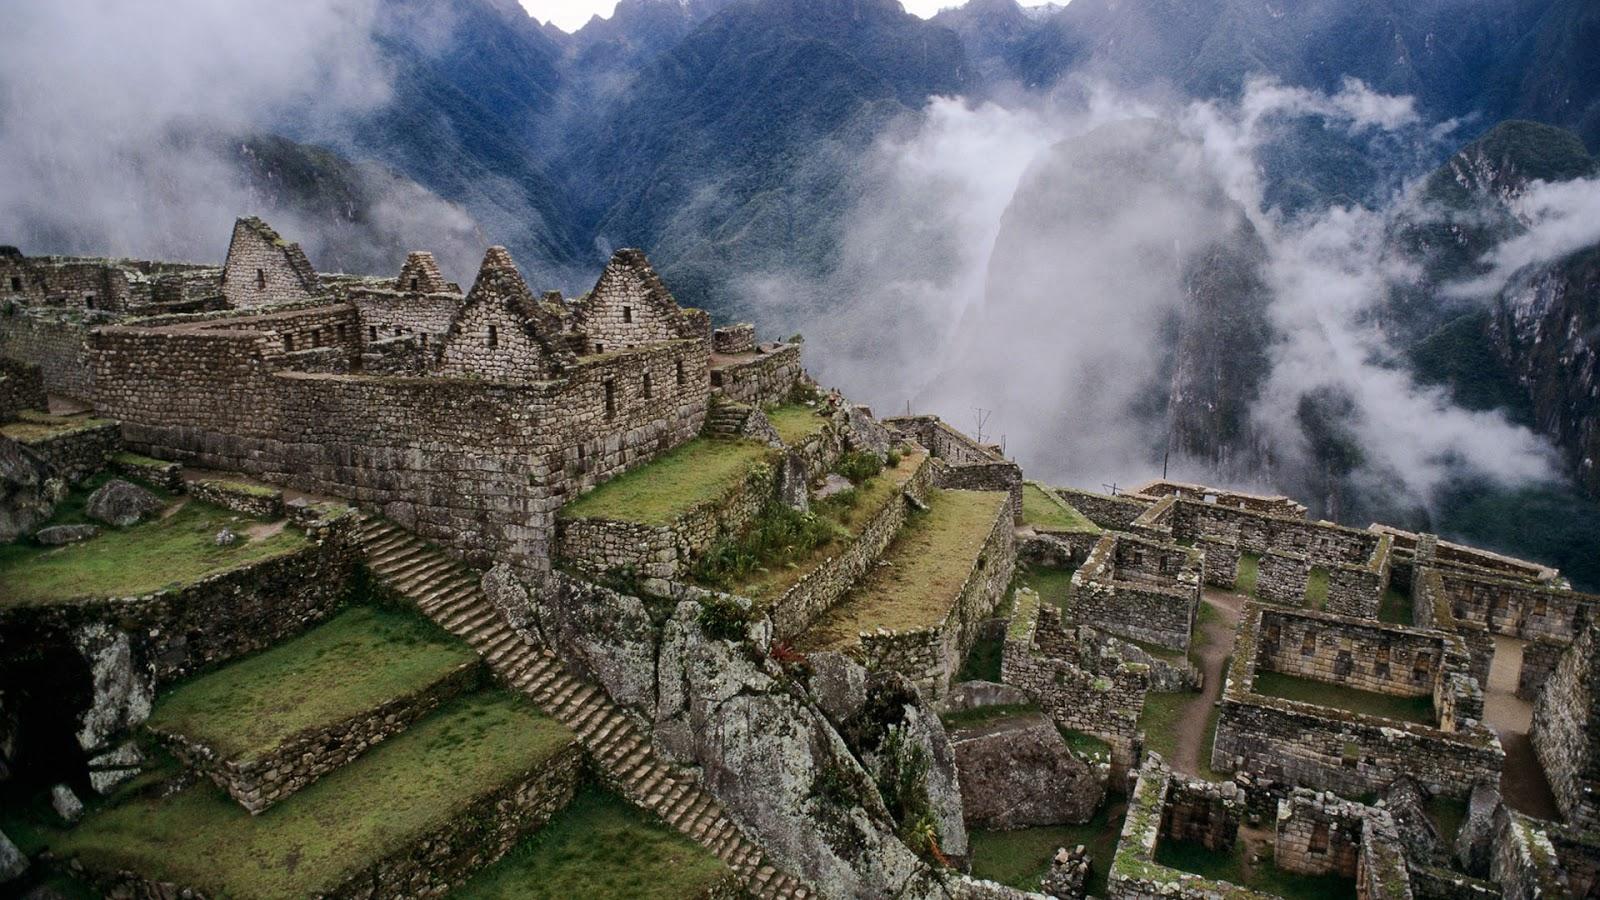 Machu Picchu Peru Hd Wallpapers High Definition